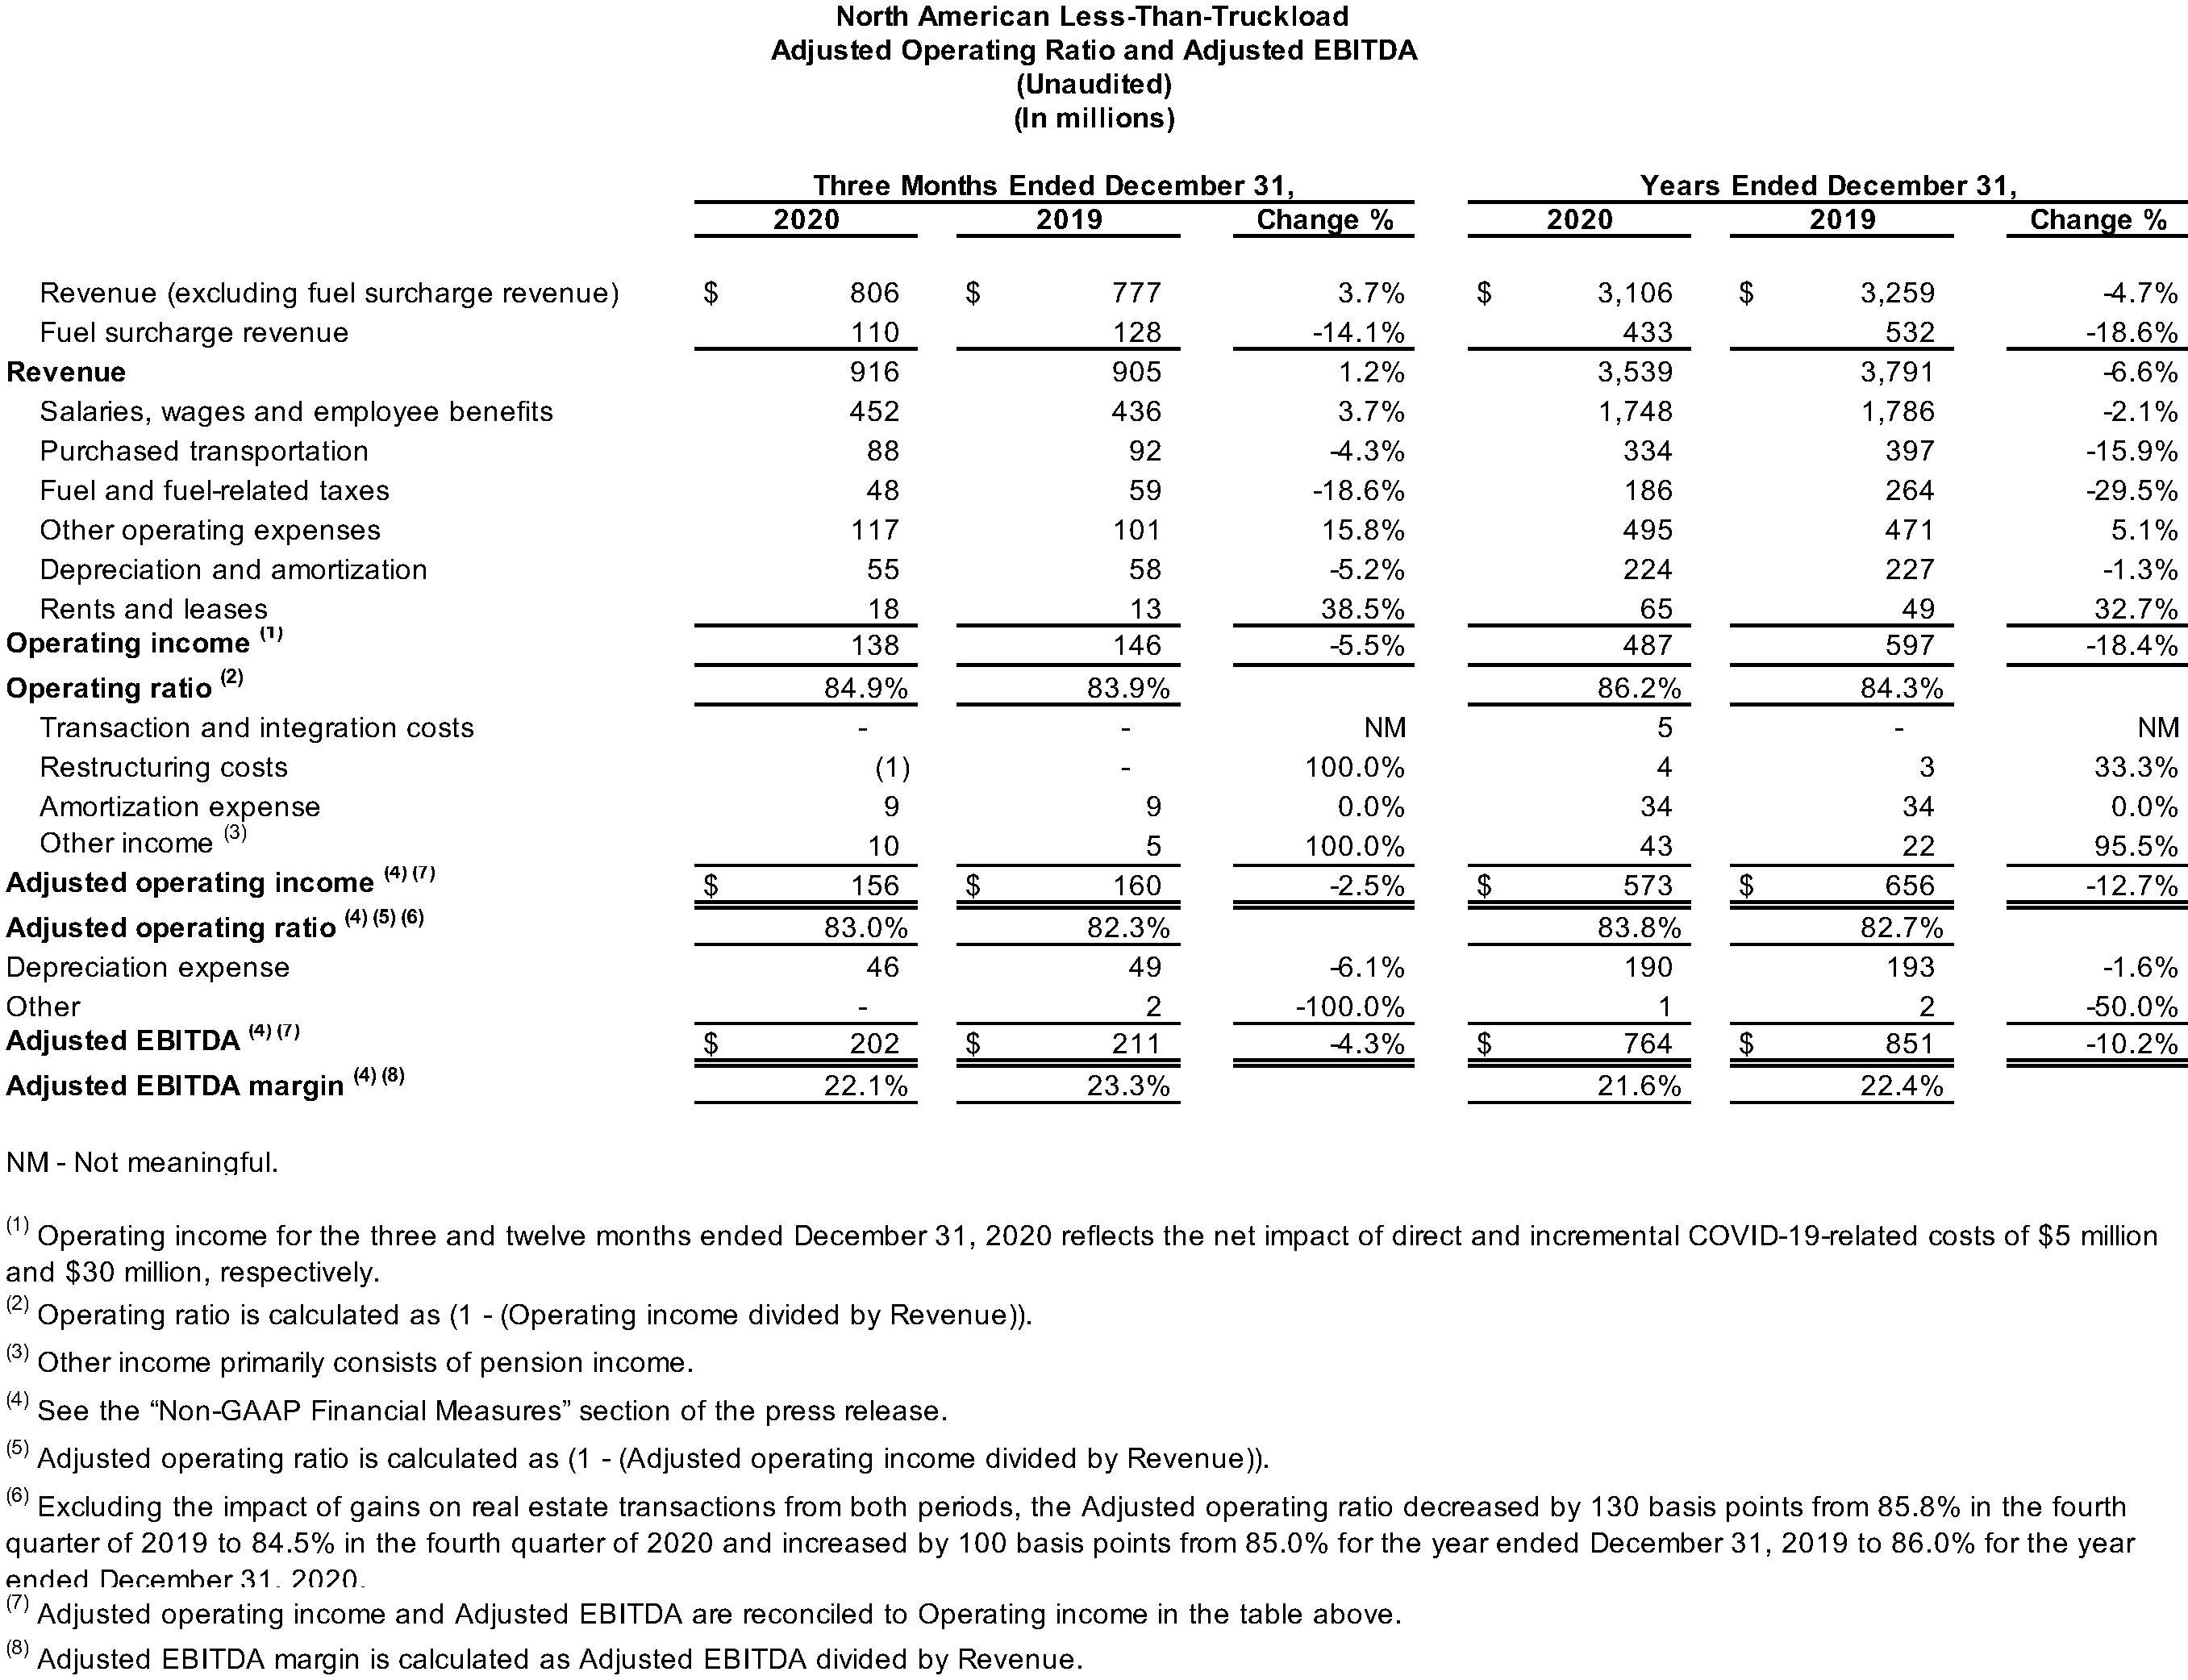 North American LTL Adjusted Operating Ratio and Adjusted EBIDTA (Unaudited)